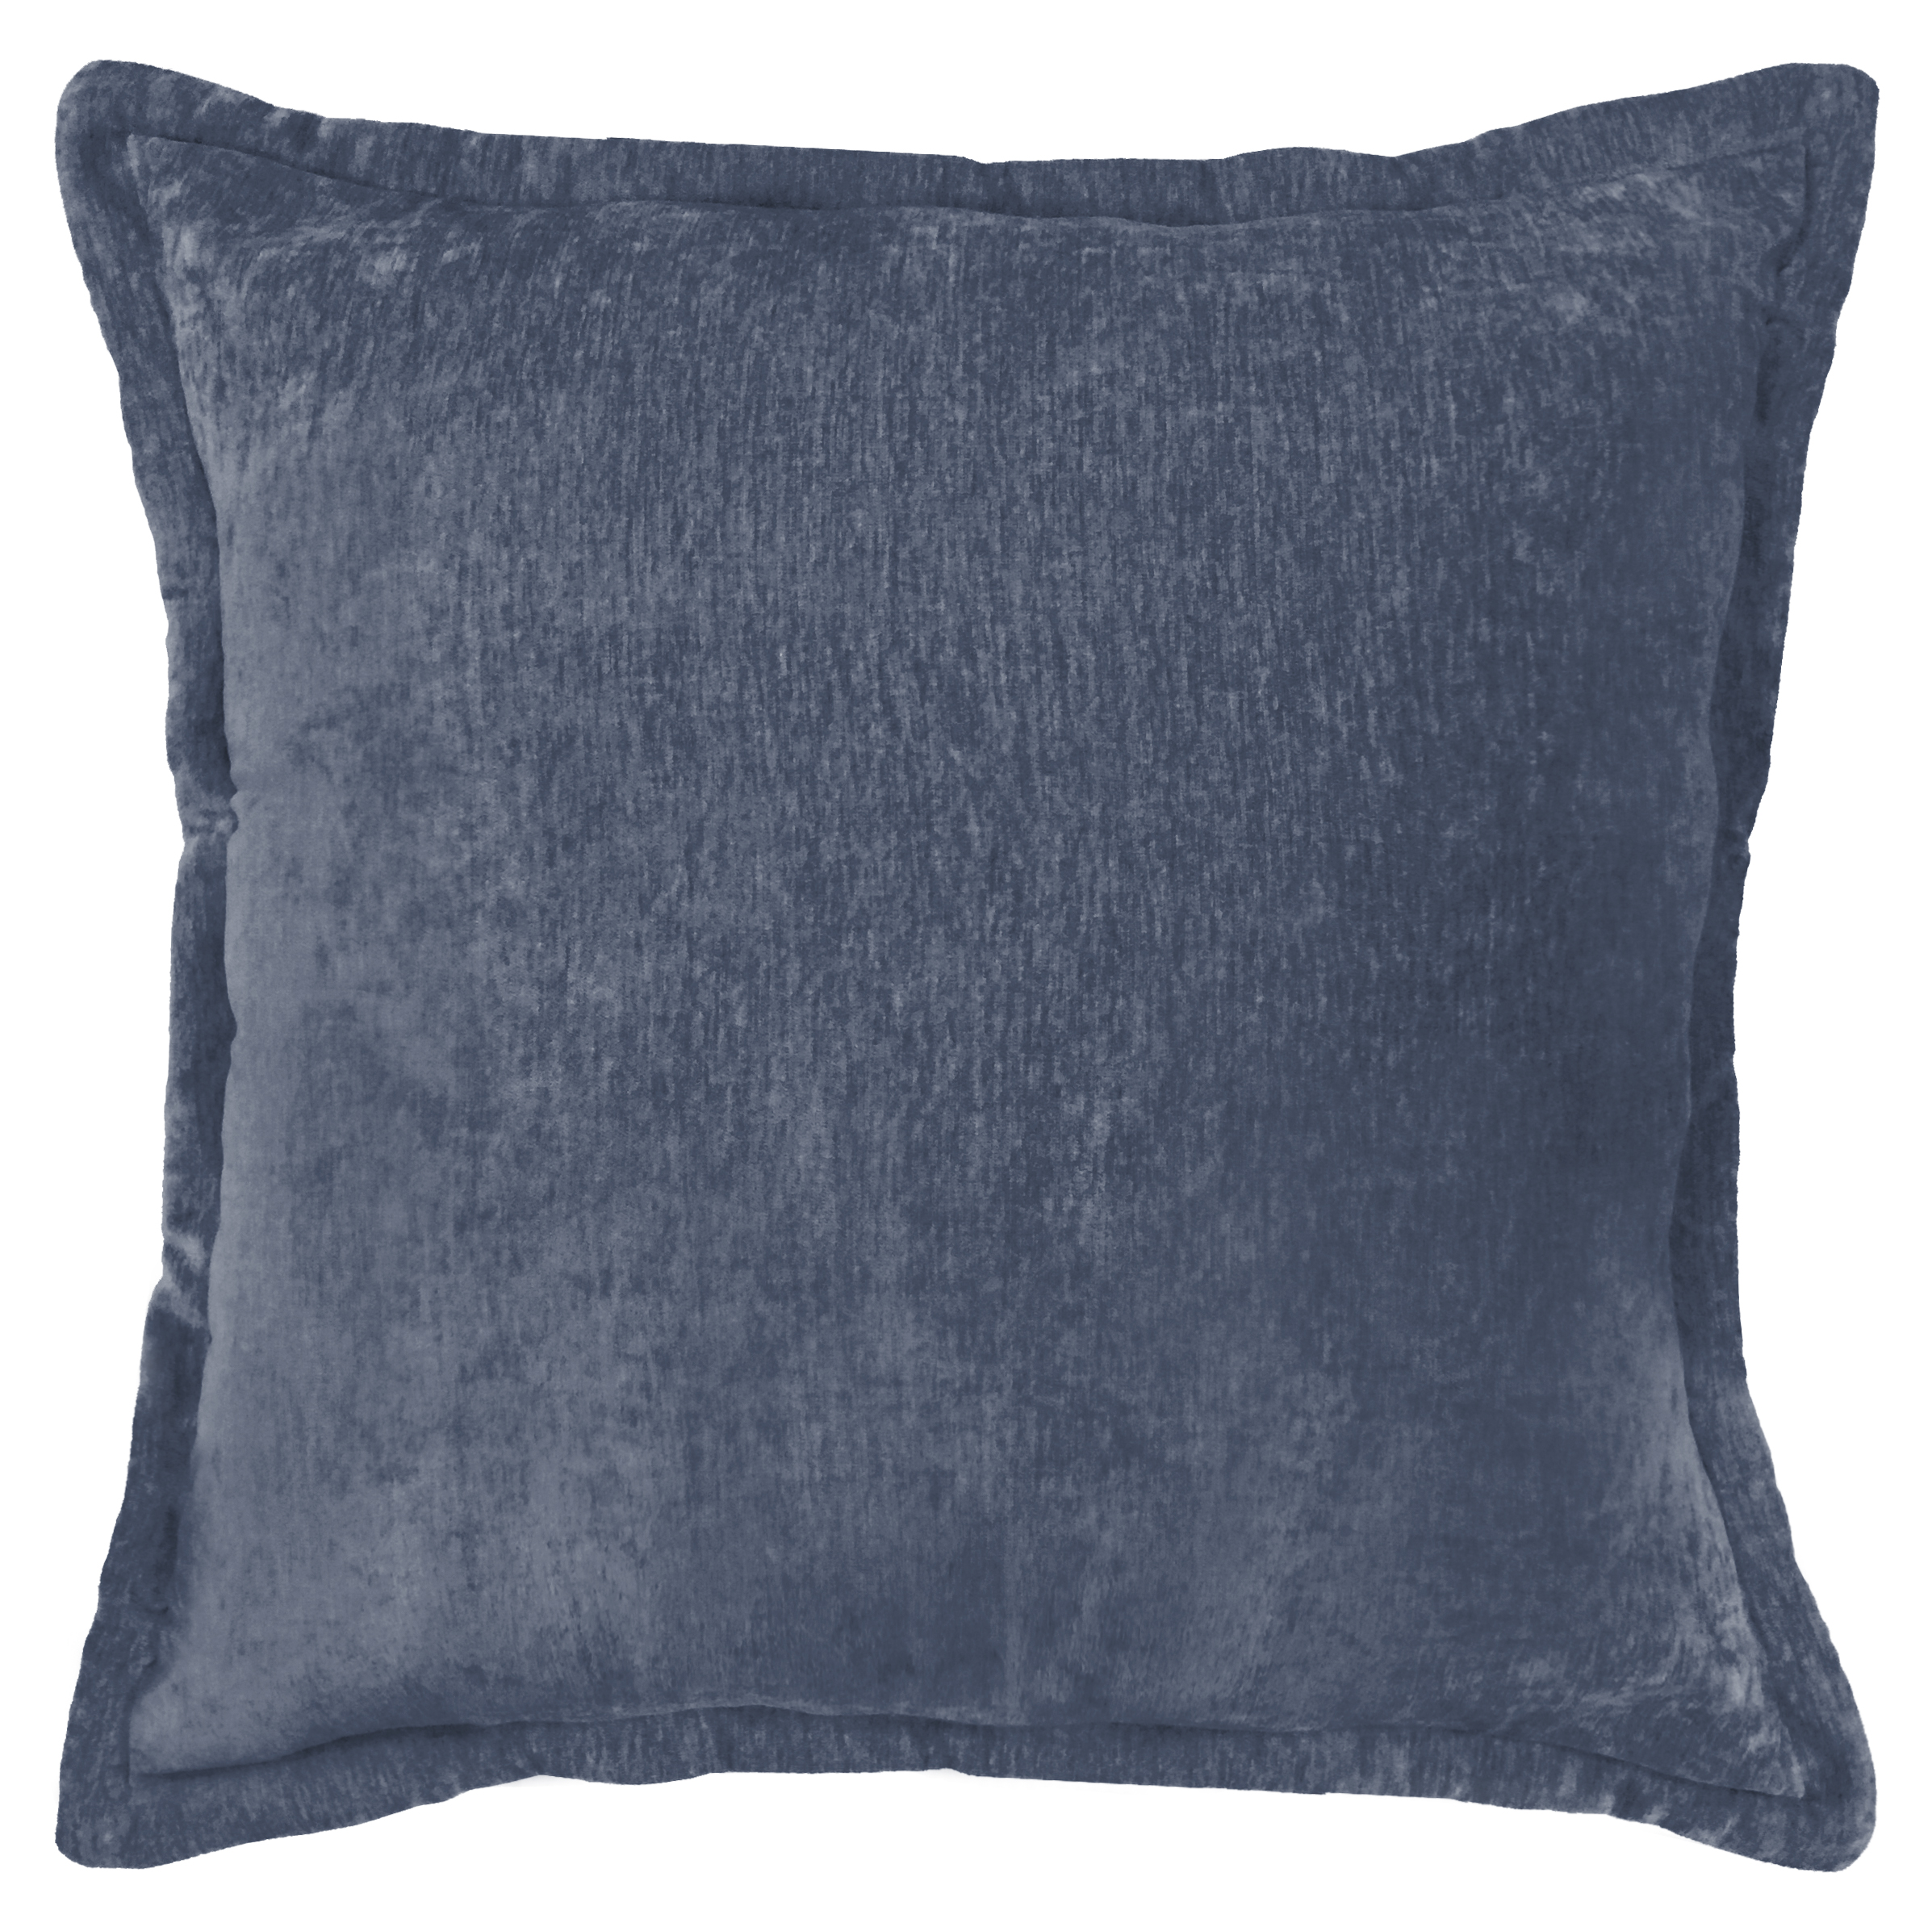 "Better Homes & Gardens Chenille Decorative Throw Pillow, 22"" x 22"","